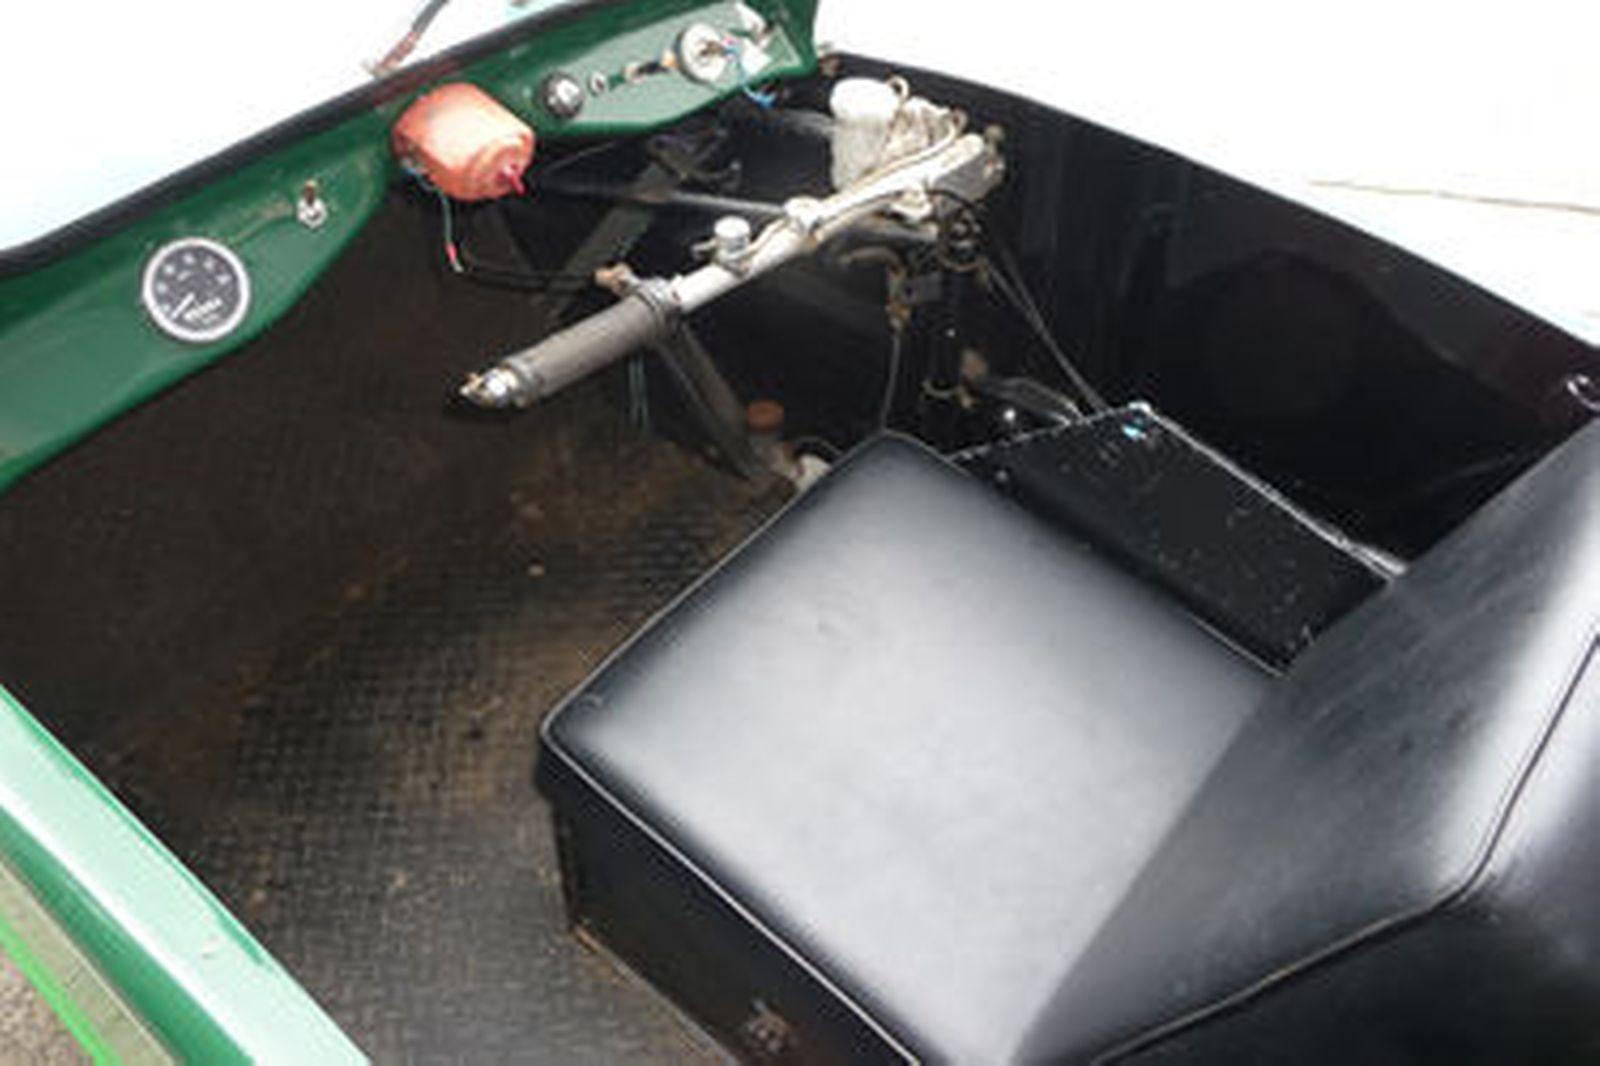 Tippen Delta MkIV 3-Wheeler Roadster